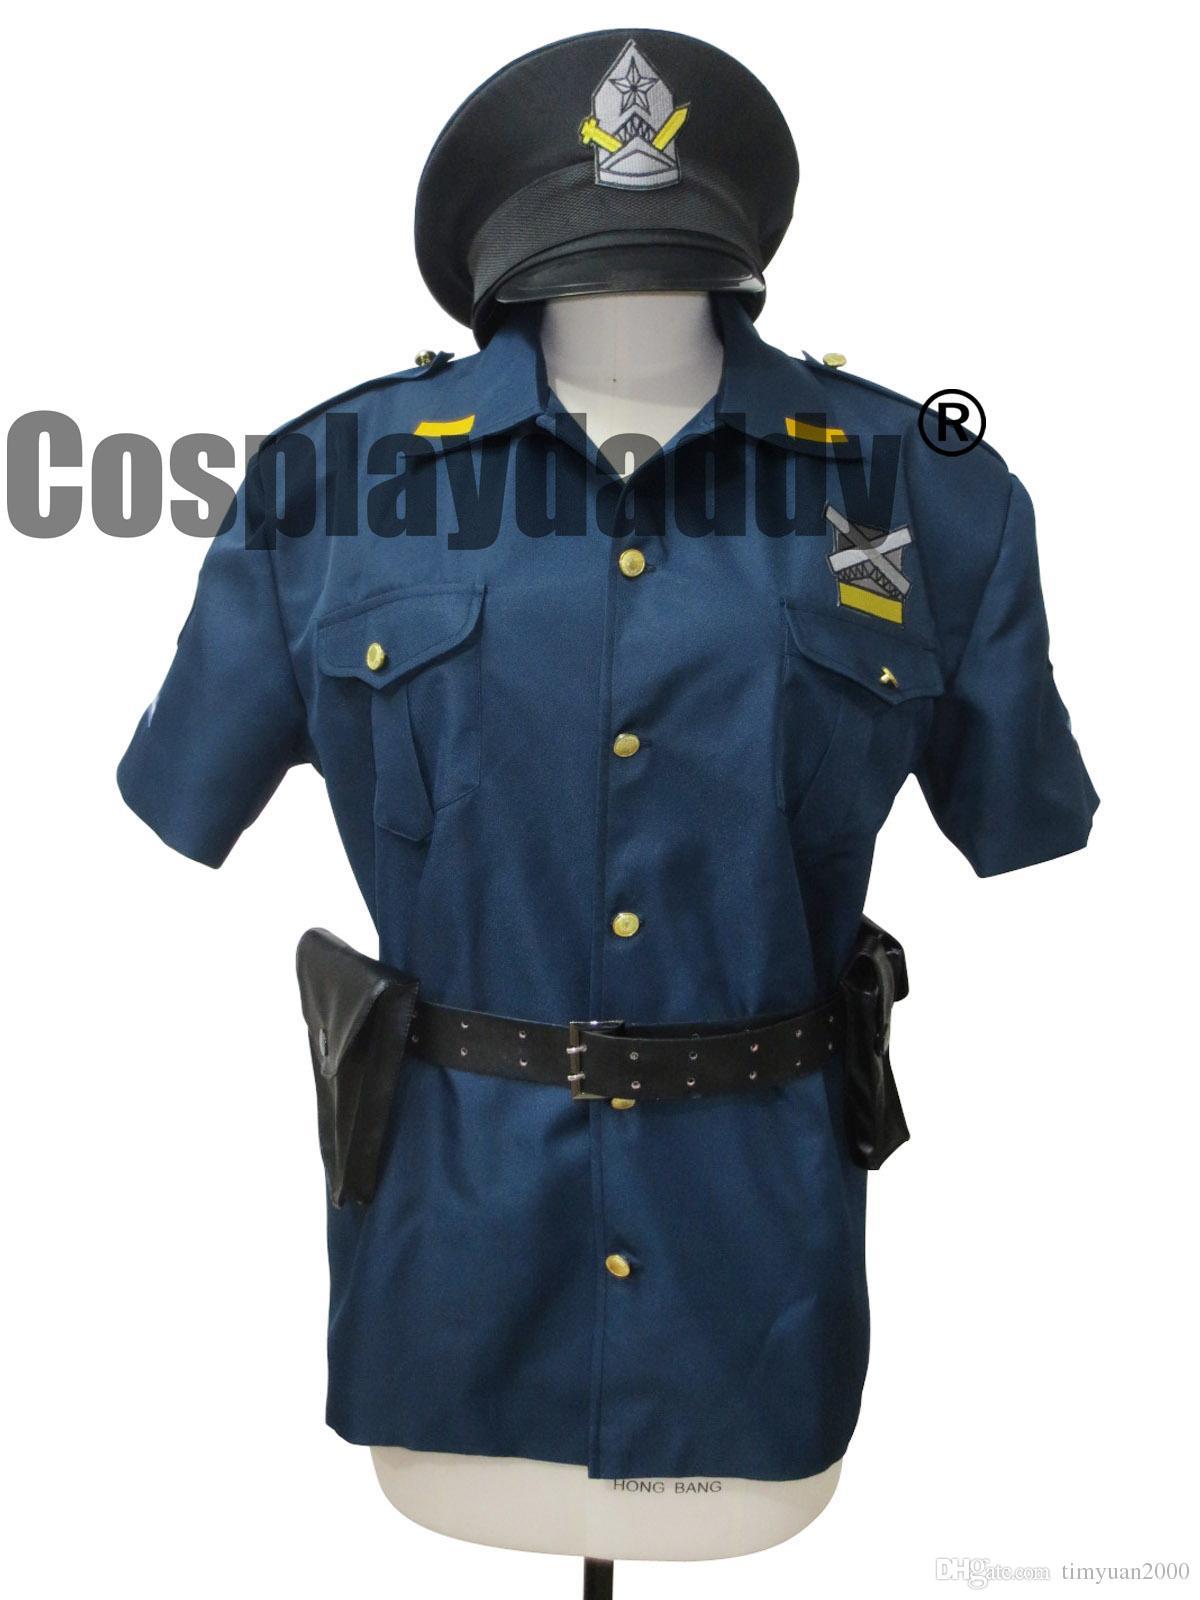 Free Eternal Summer Rin Matsuoka Sousuke Yamazaki Cosplay Army Uniform Suit Cosplay Costumes Perth Cosplaycostumes From Timyuan2000 89 35 Dhgate Com ◂free!◂↦ℱrom the skies ꭿbove.☰rin matsuoka;⋗hbd, belén! dhgate com